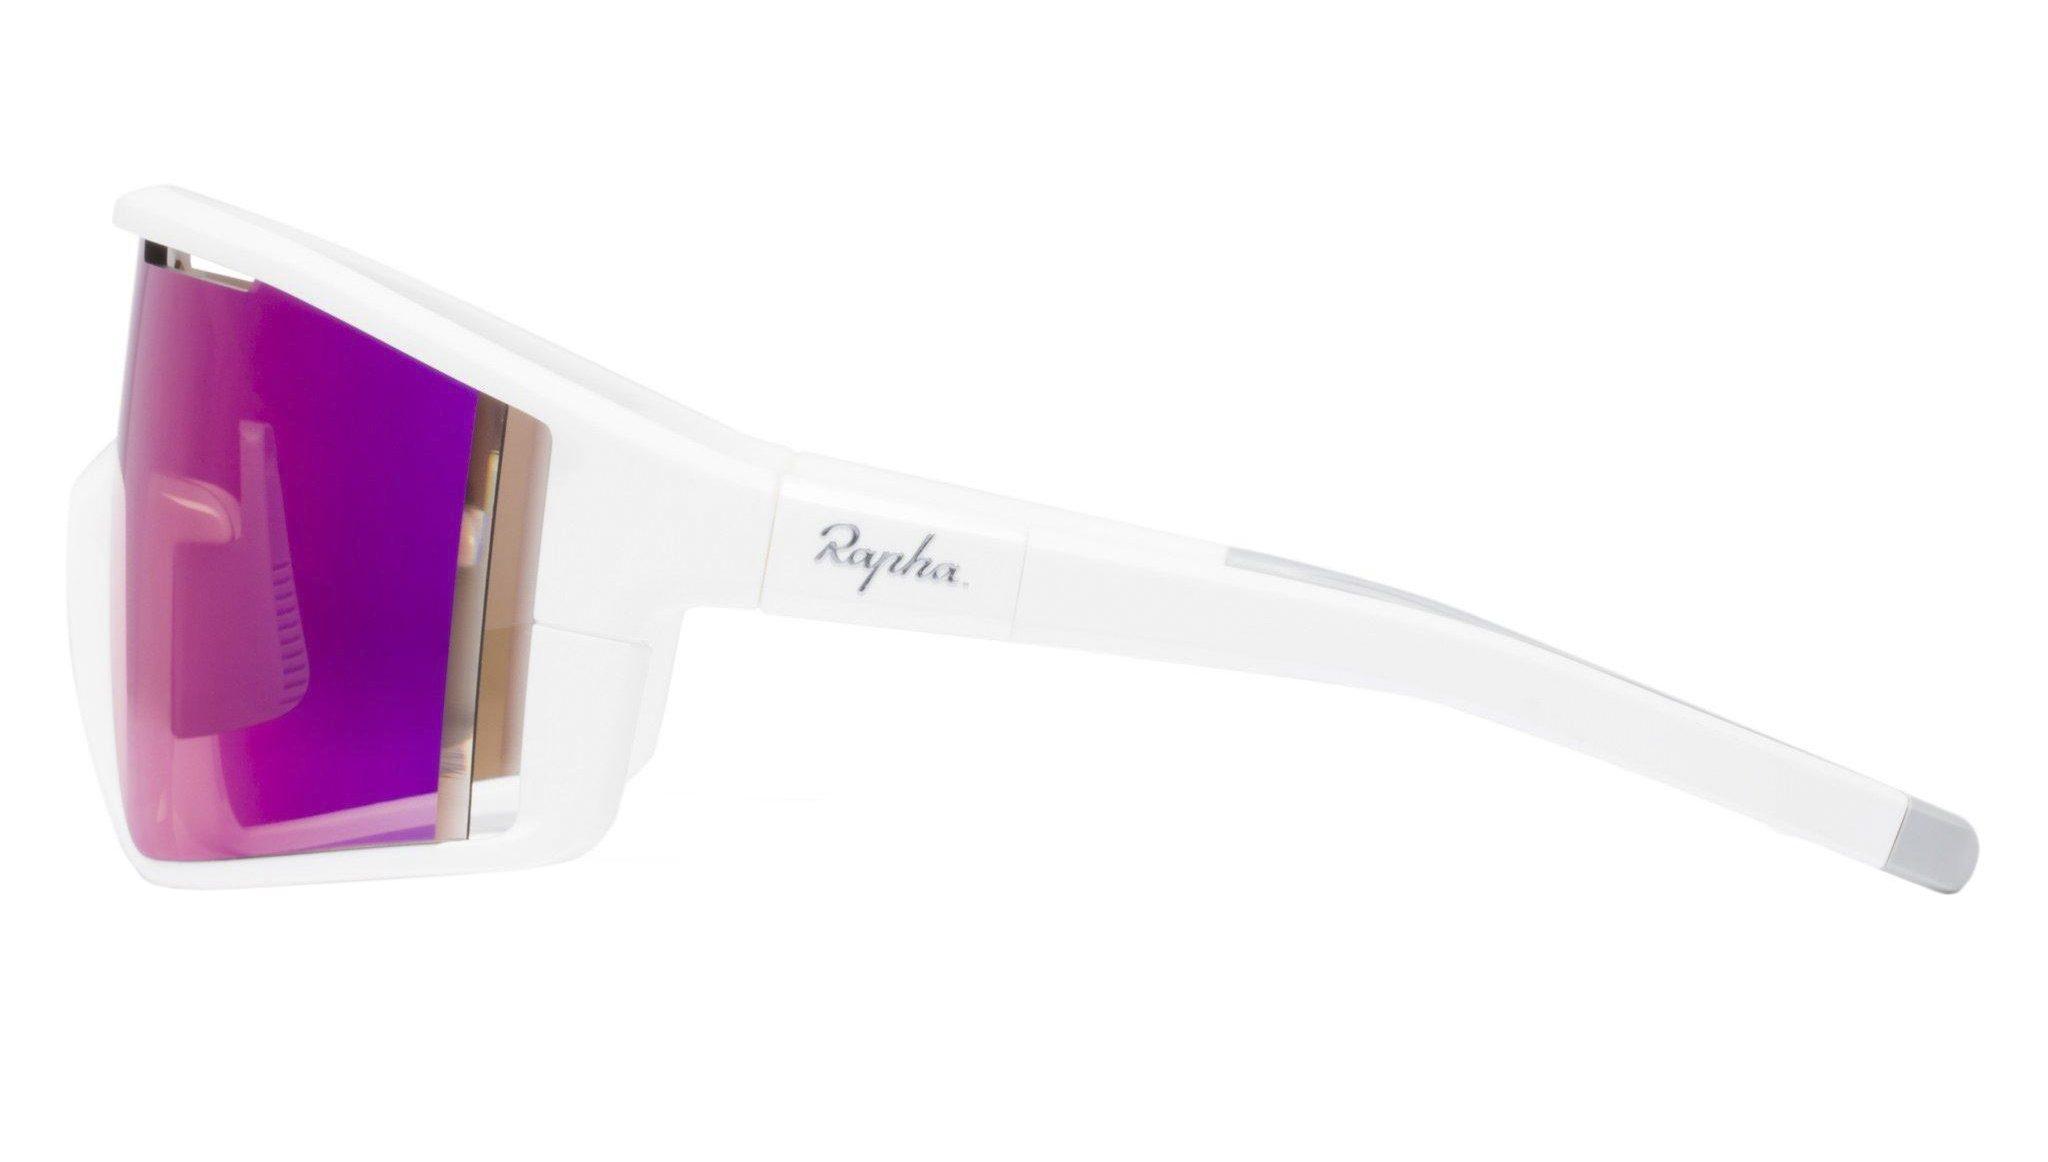 Rapha fietsbril